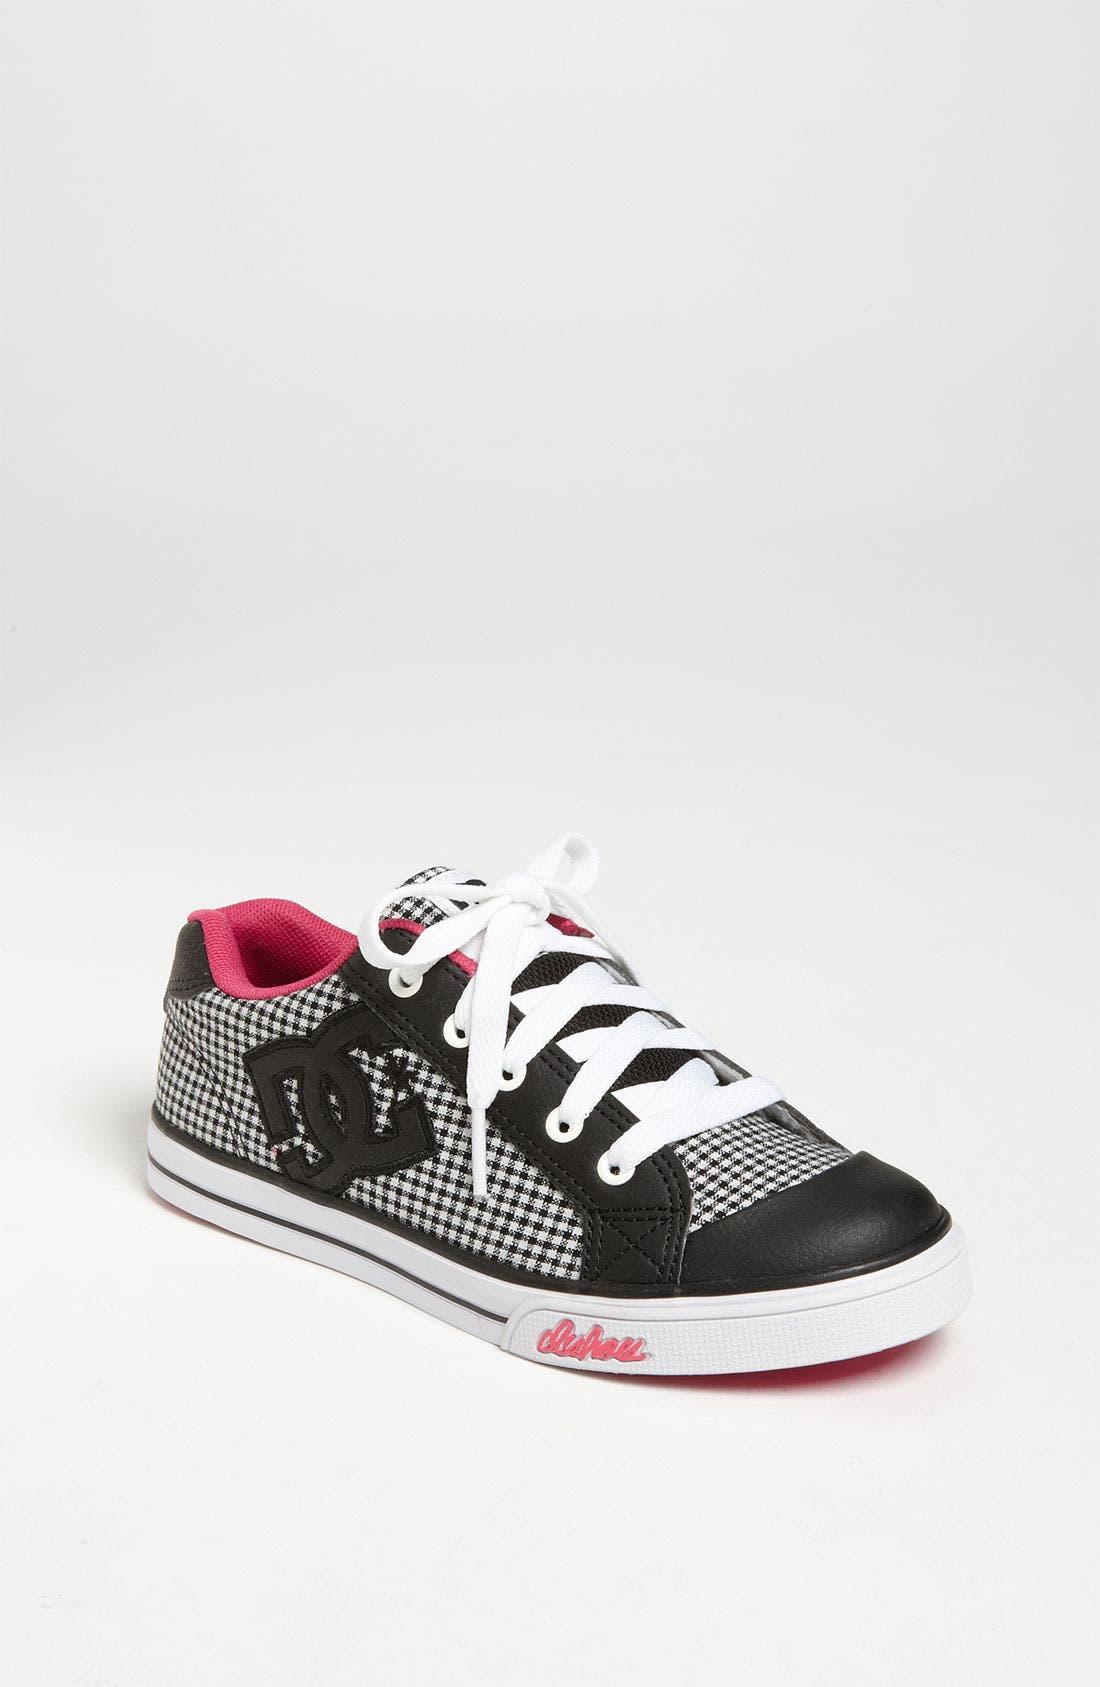 Main Image - DC Shoes 'Chelsea Charm' Sneaker (Toddler, Little Kid & Big Kid)